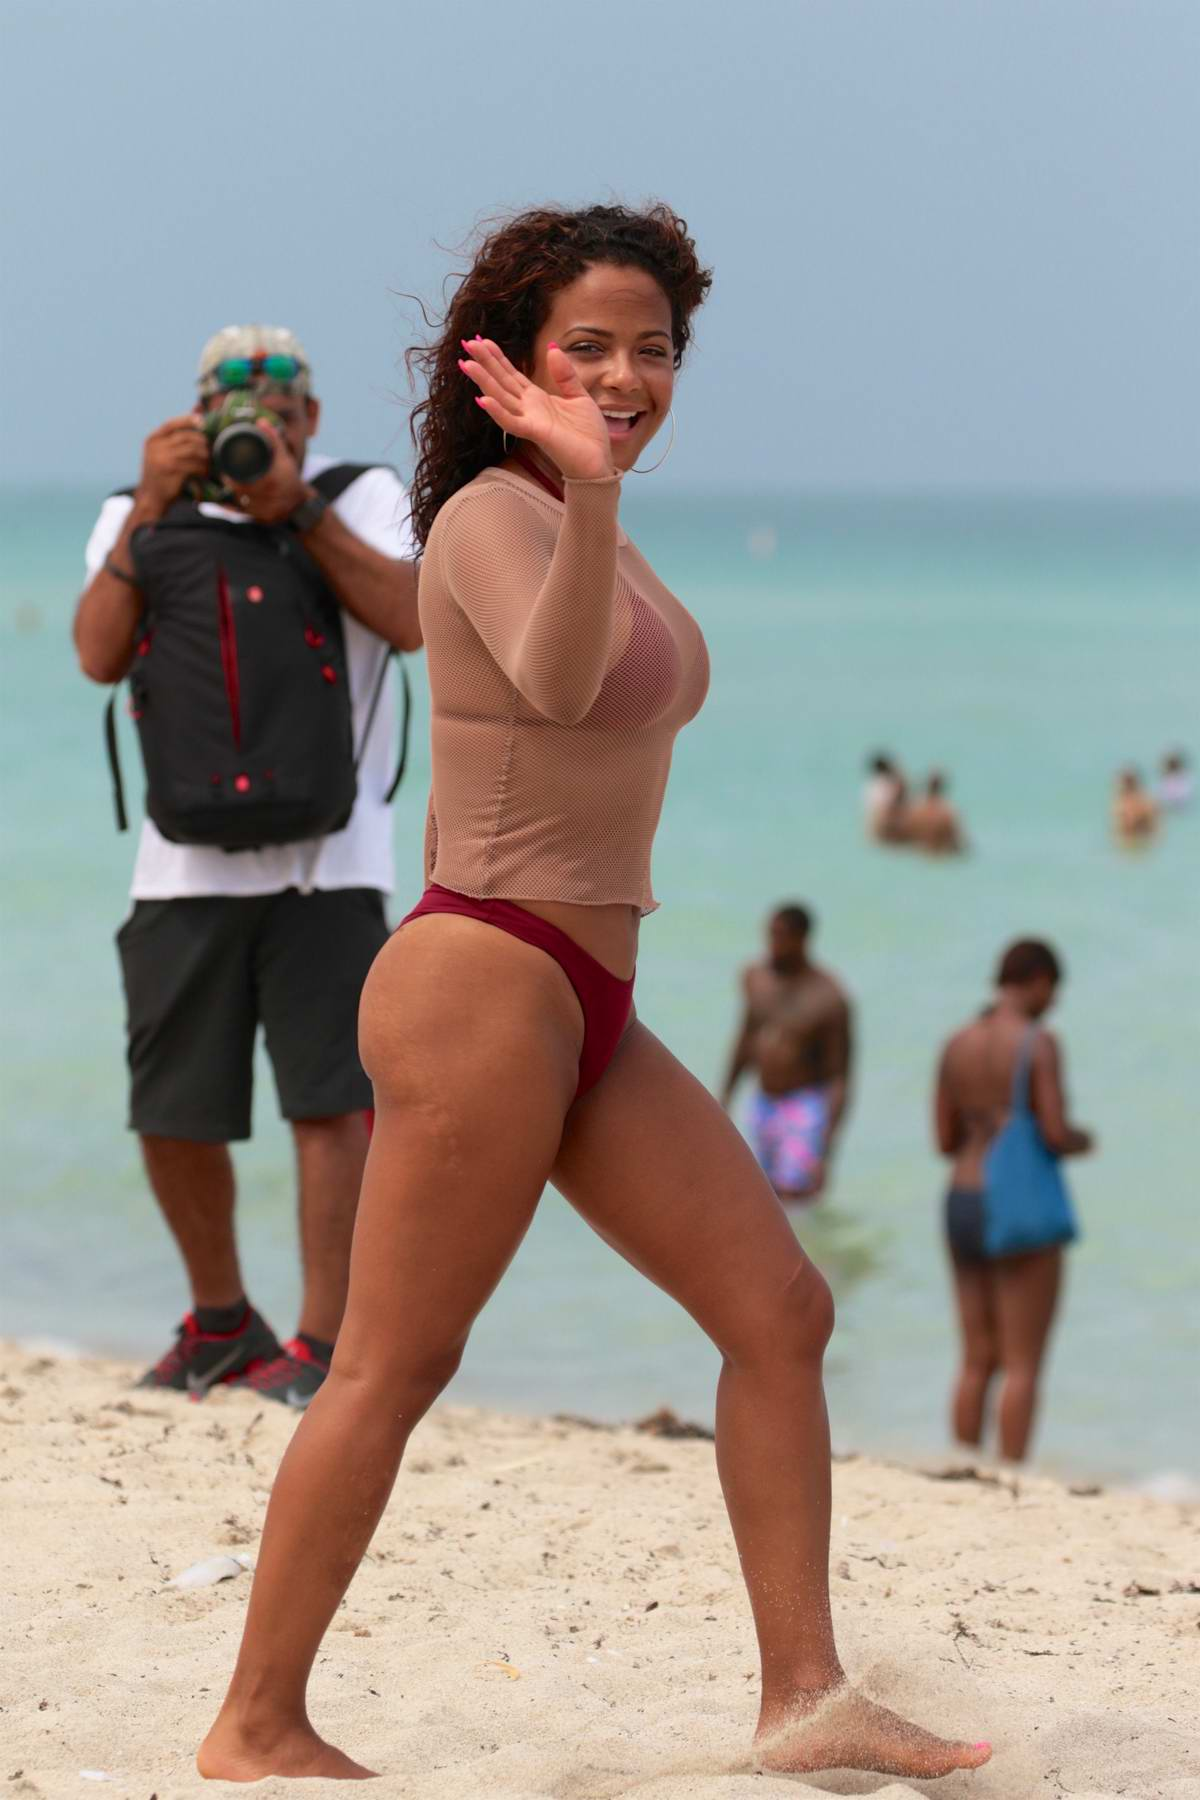 Christina Milian in a Burgundy Bikini on the Beach in Miami